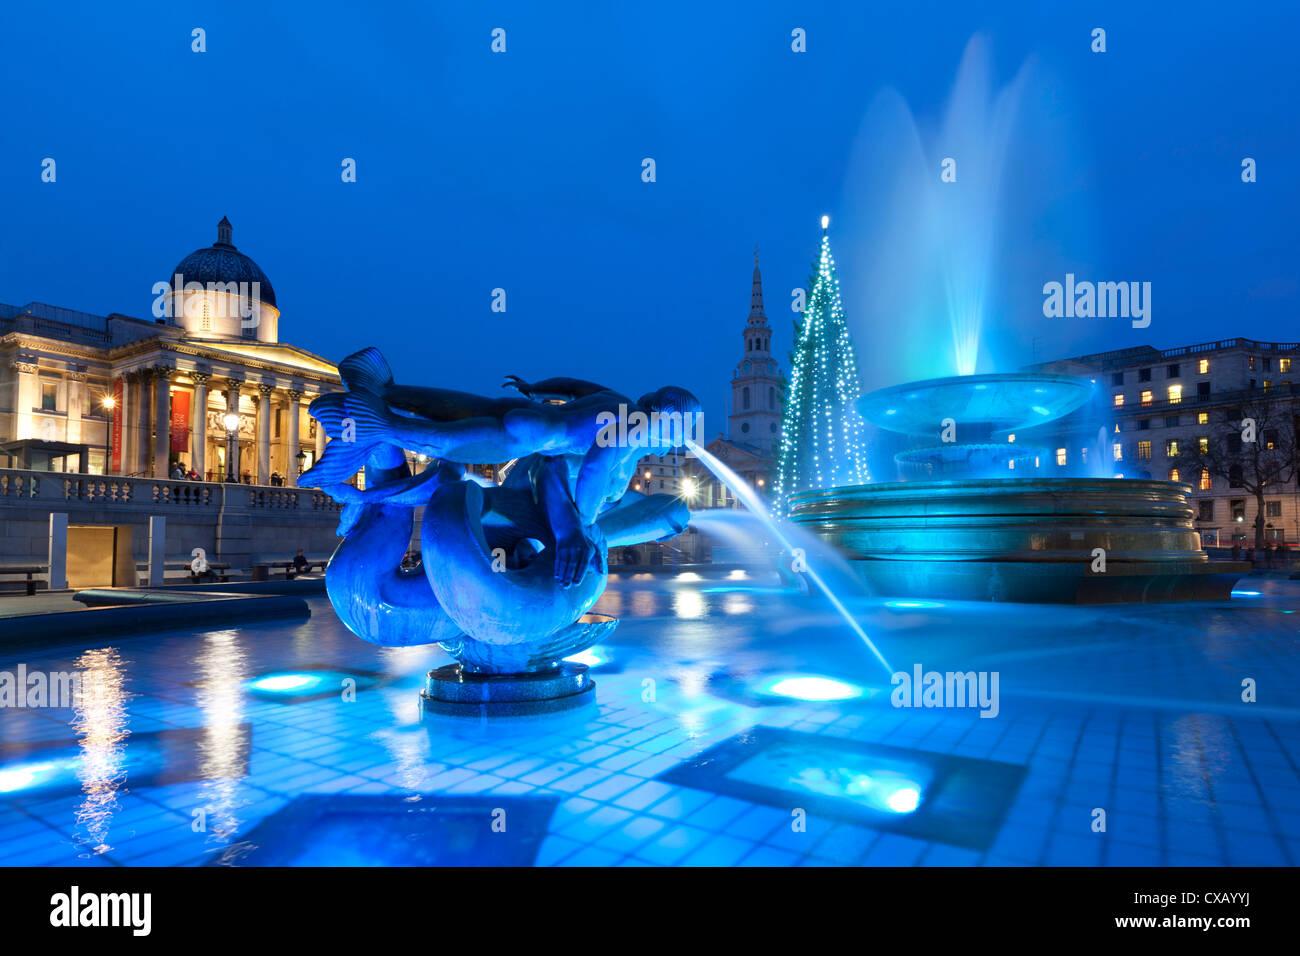 Trafalgar Square at Christmas, London, England, United Kingdom, Europe Stock Photo